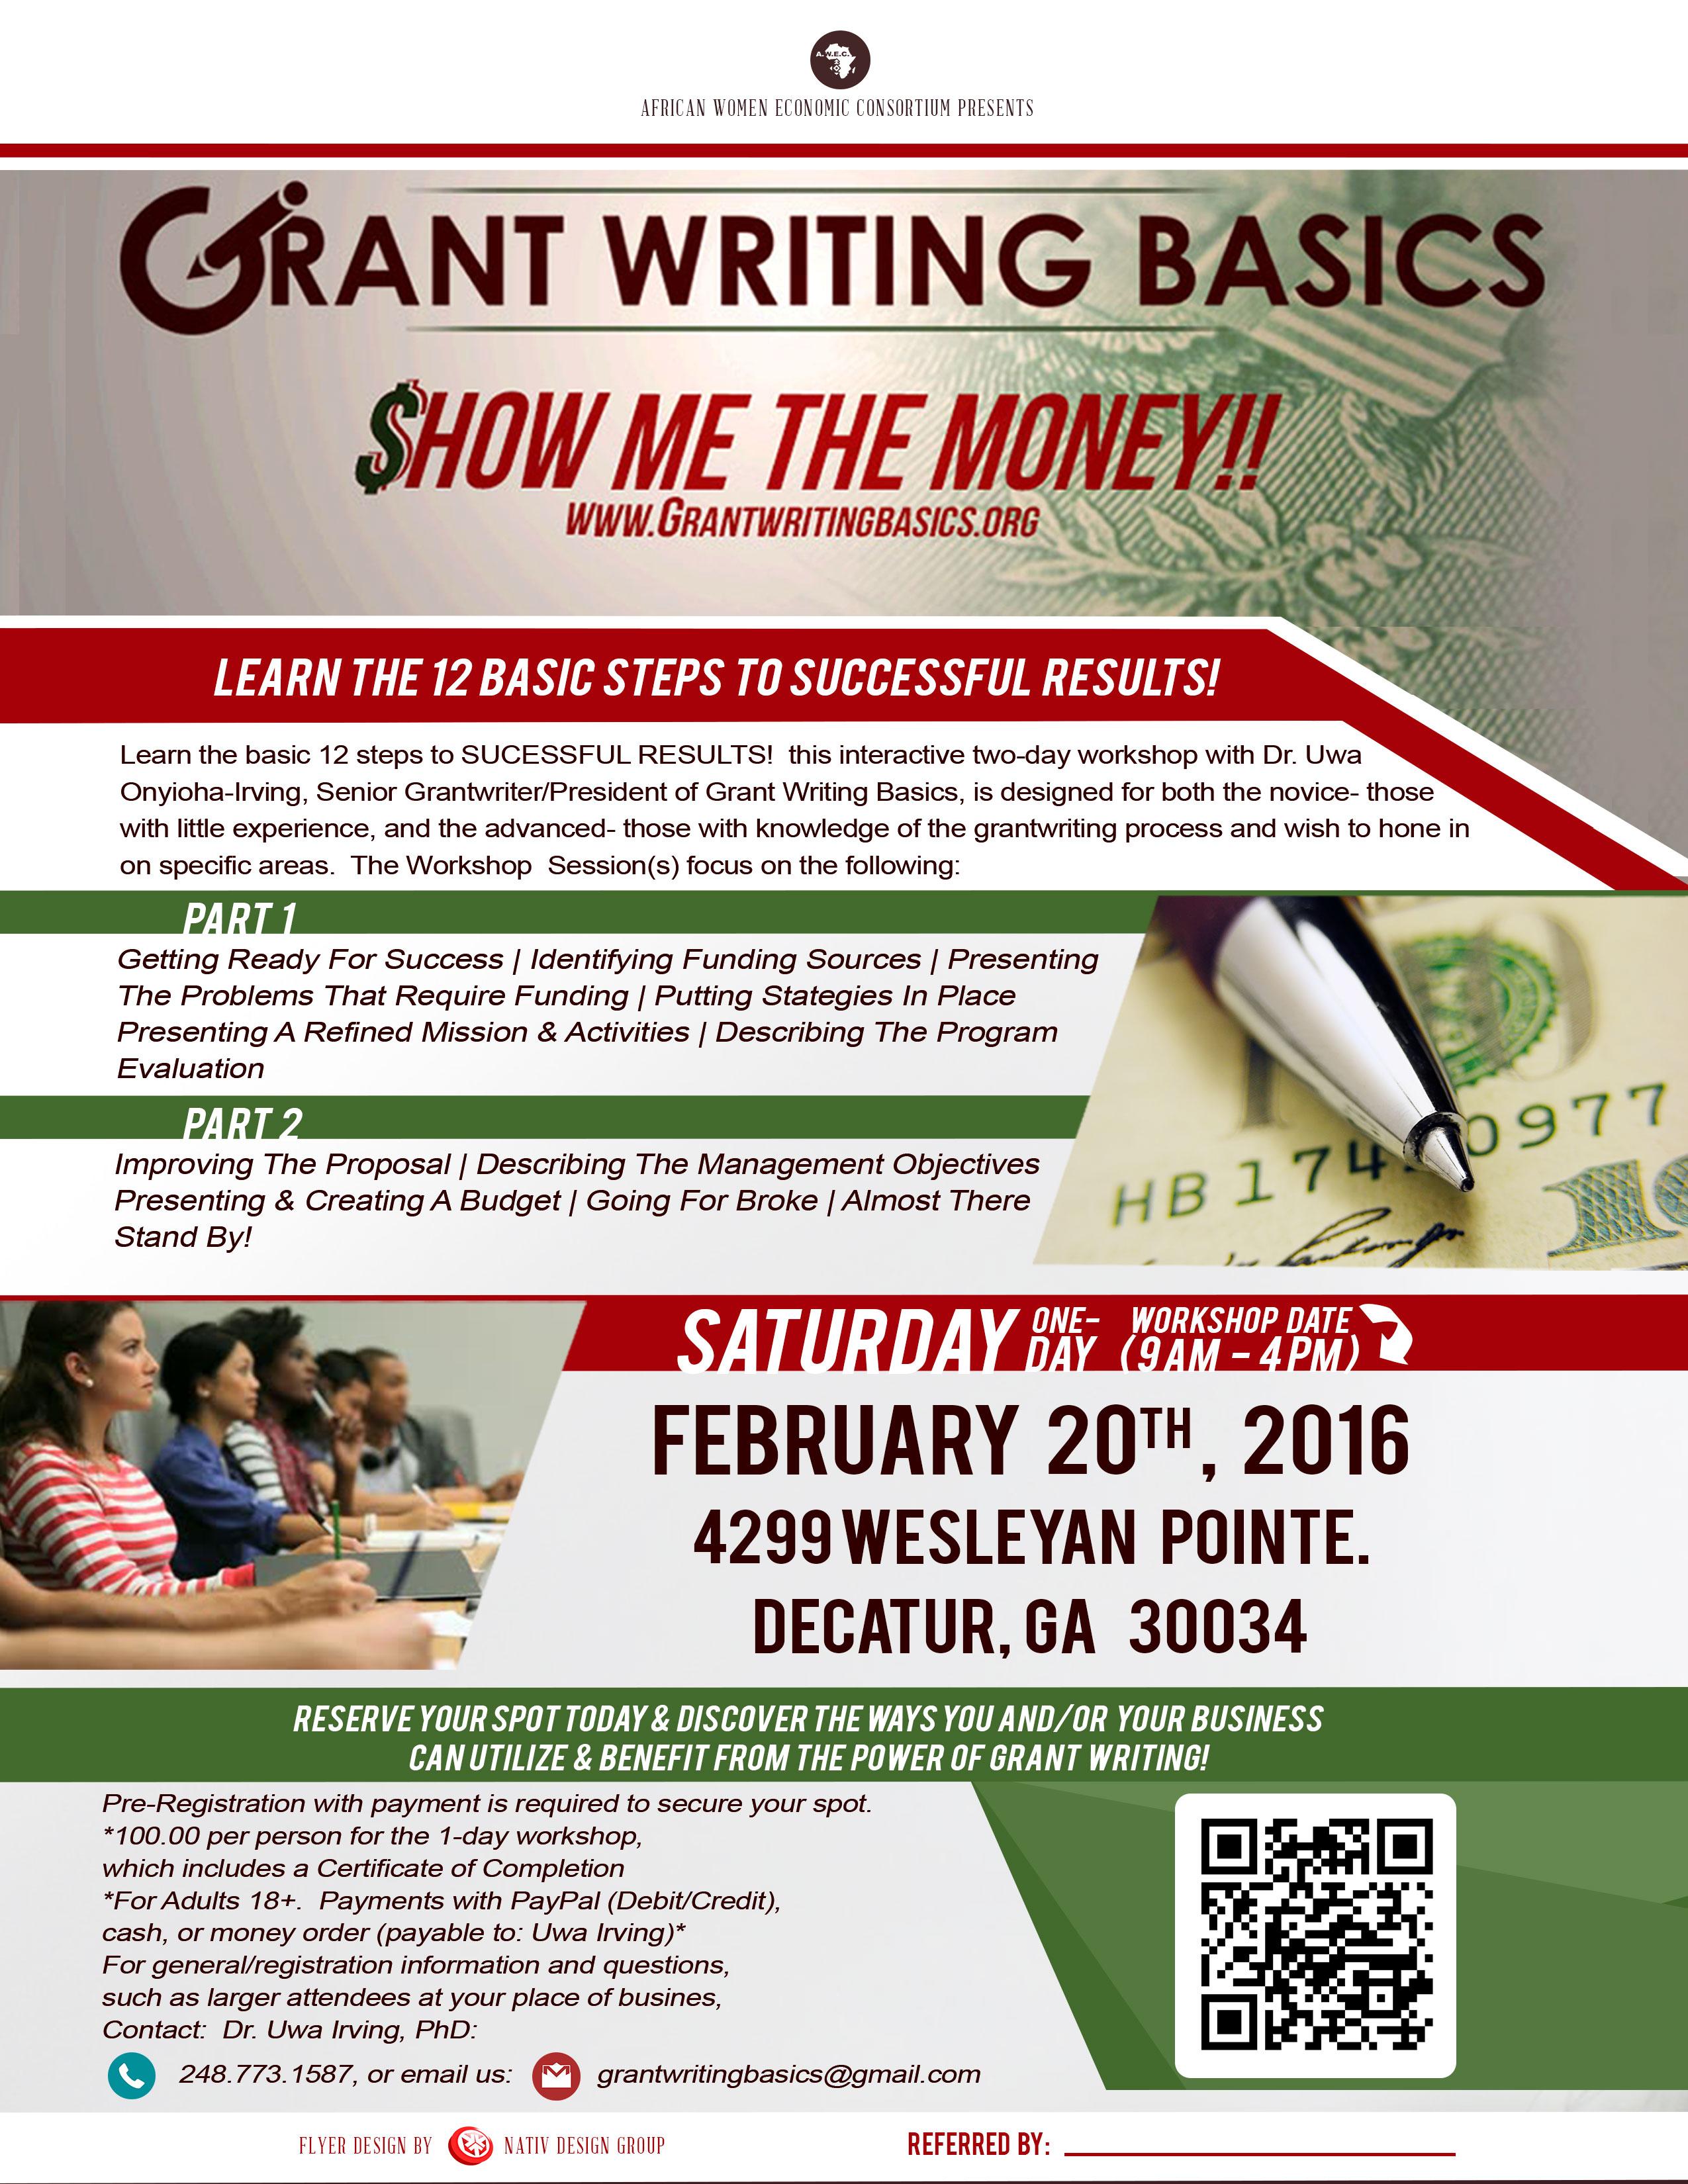 Grant writing service workshop toronto 2016